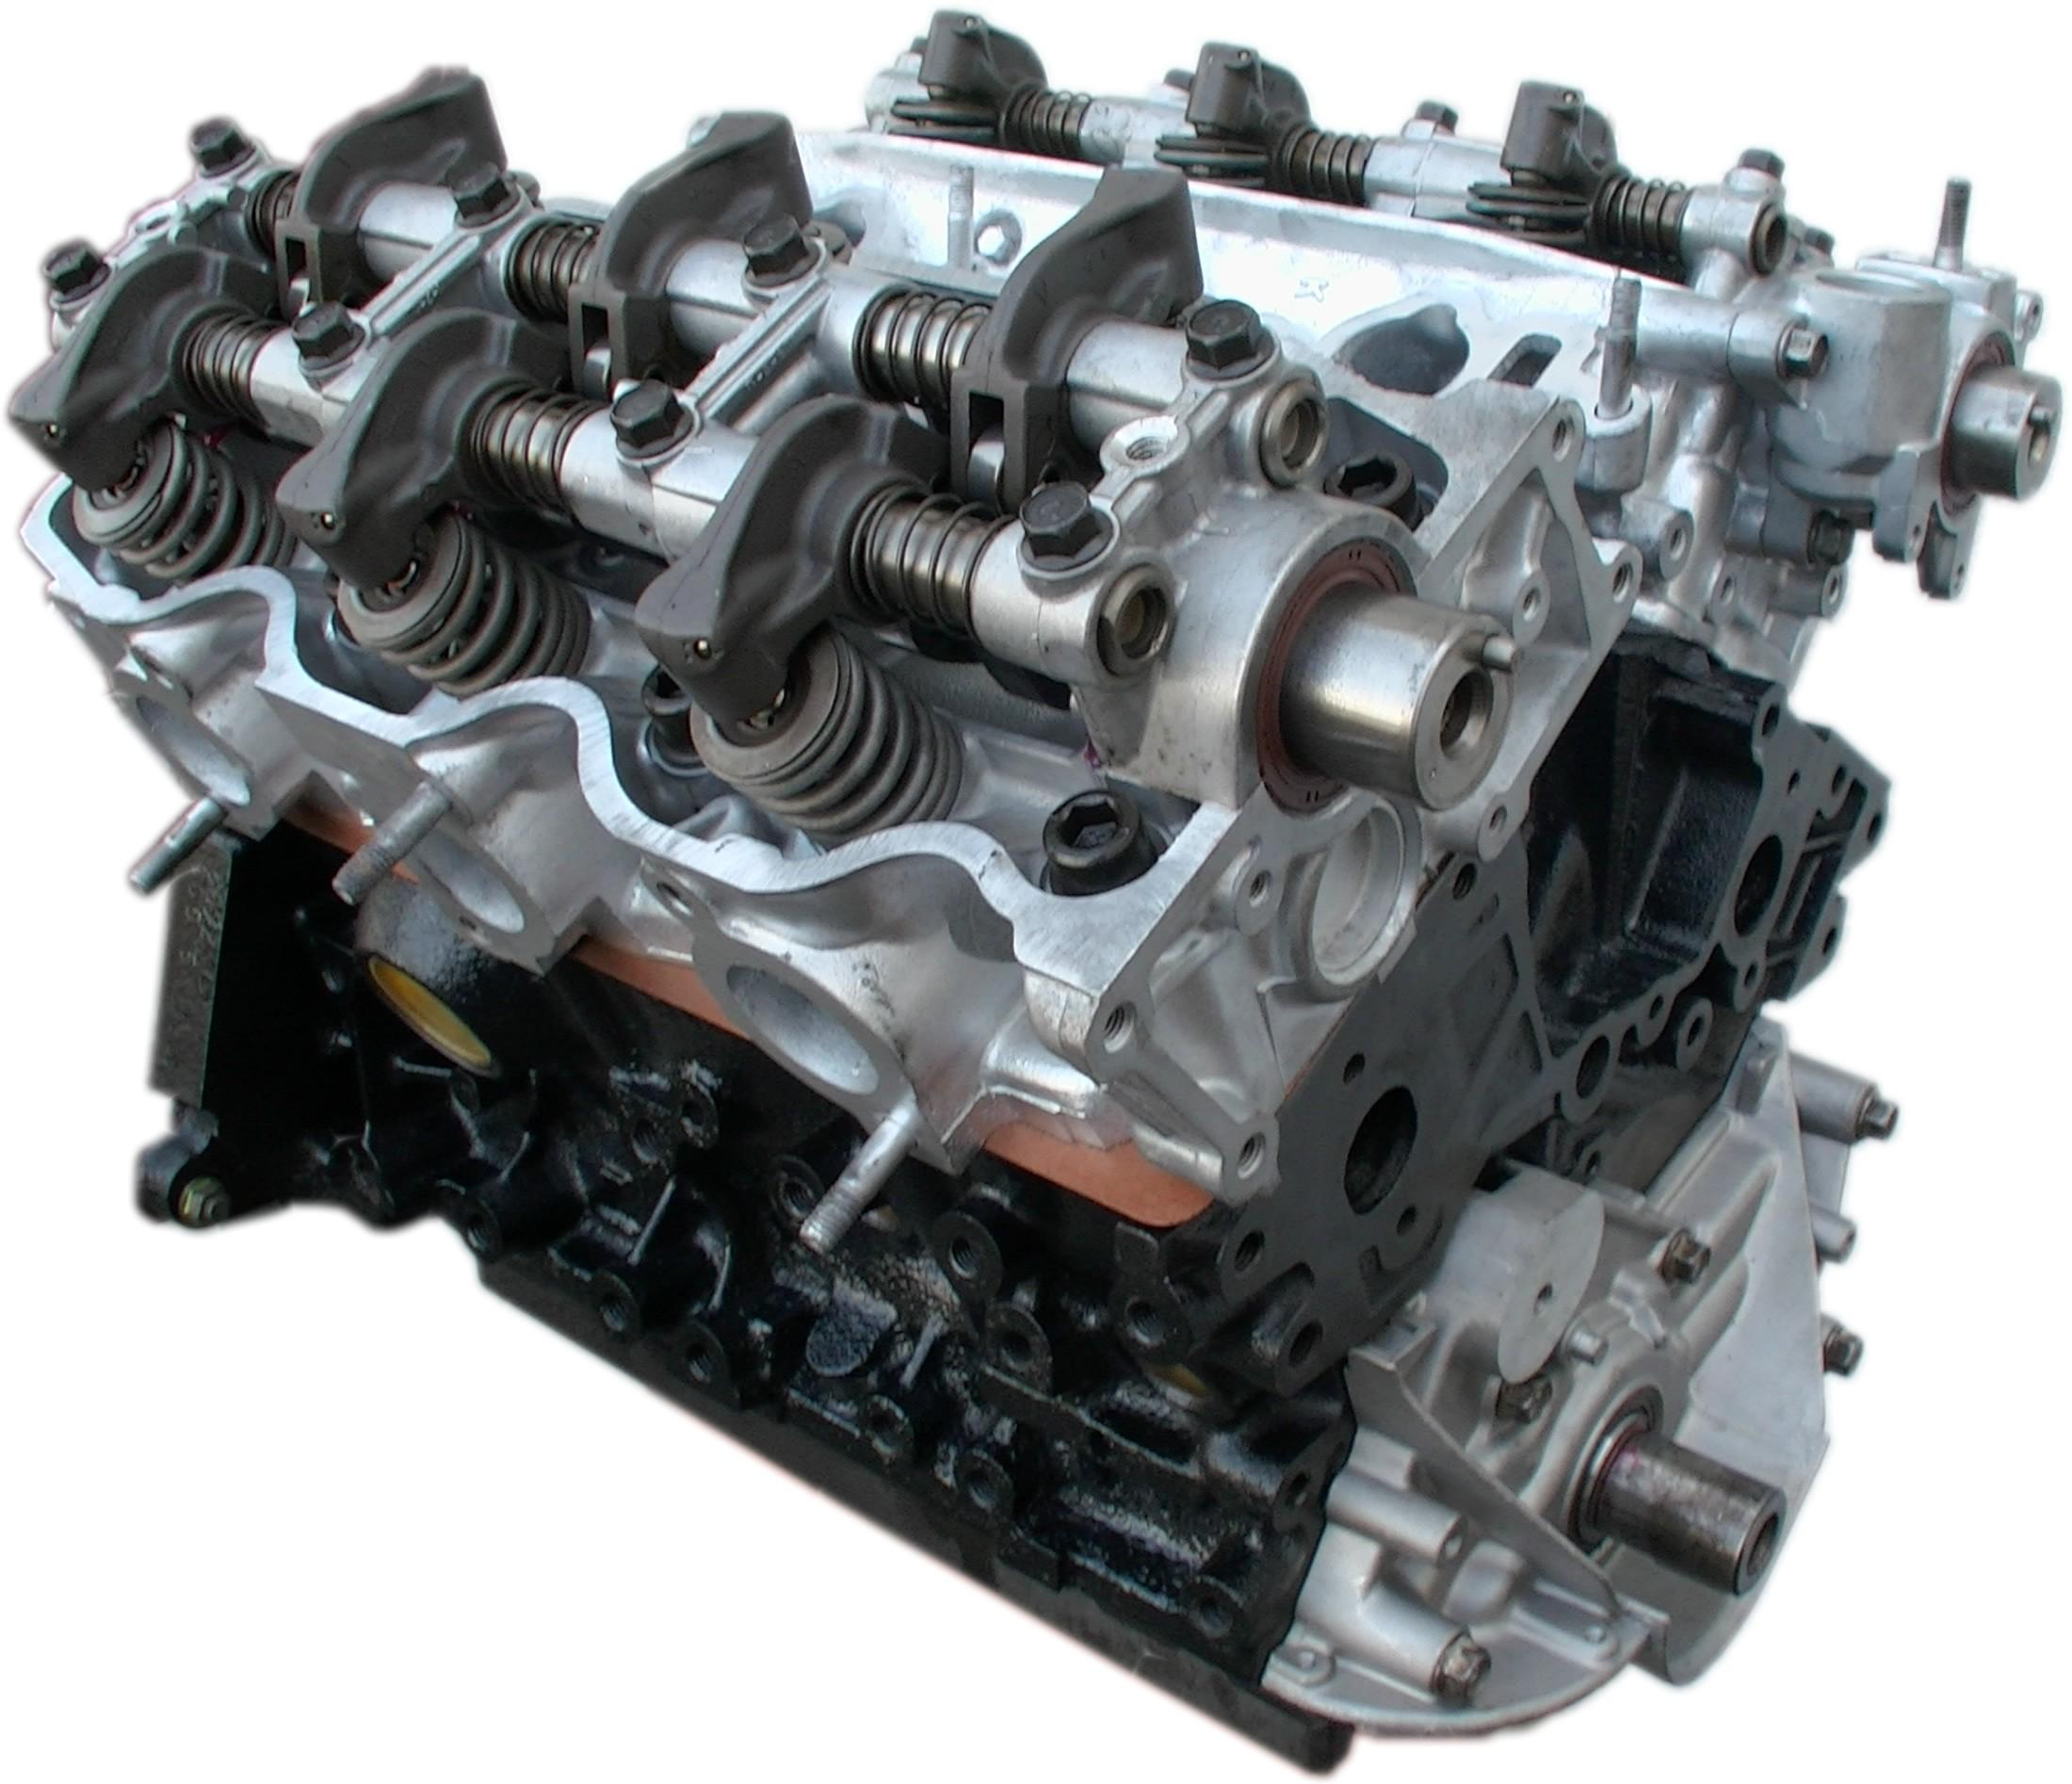 Rebuilt Plymouth Voyager 6g72 3 0l Engine 171 Kar King Auto